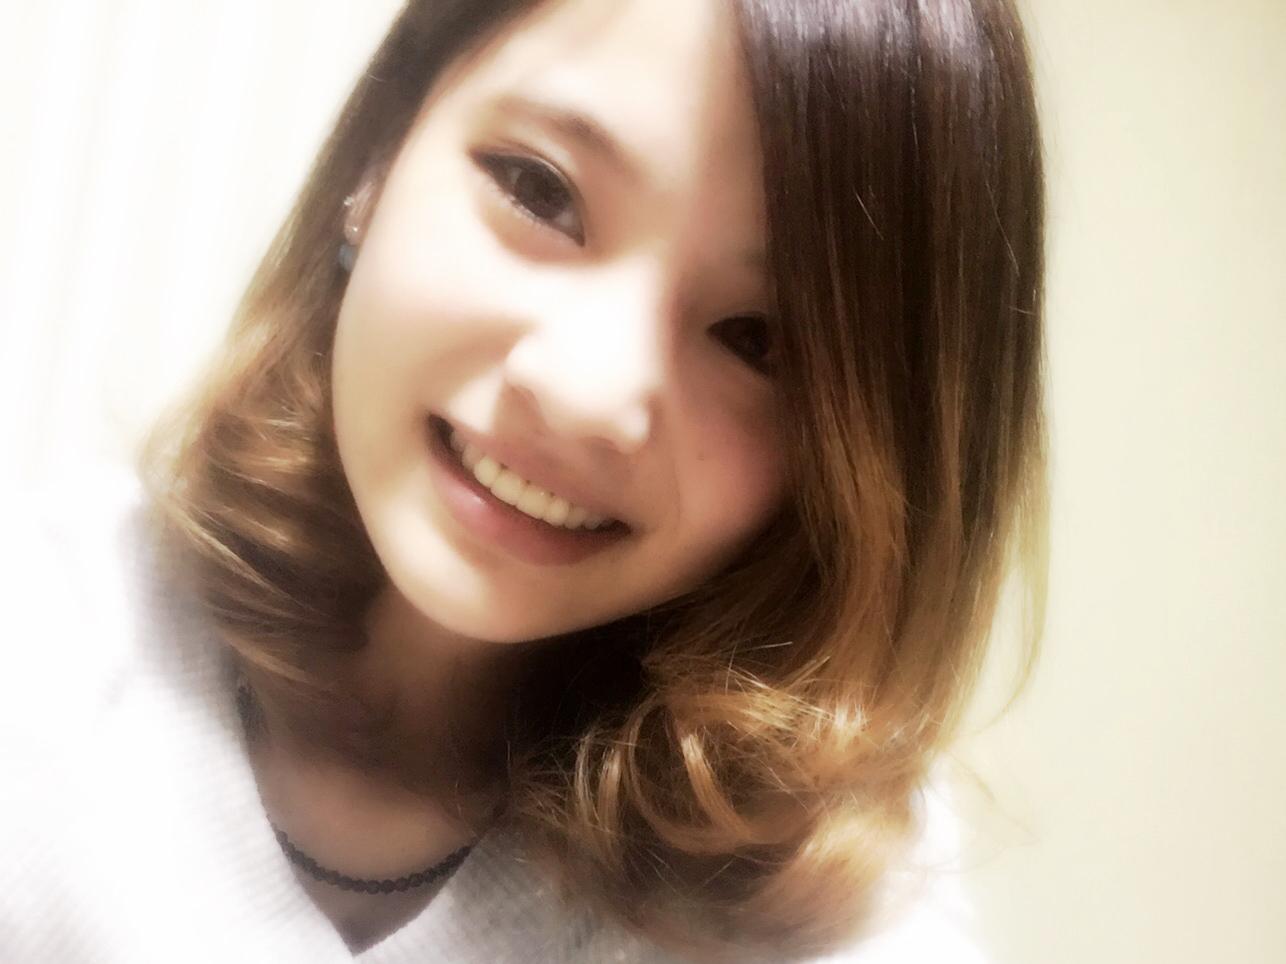 KUMIx21 - Japanese webcam girl